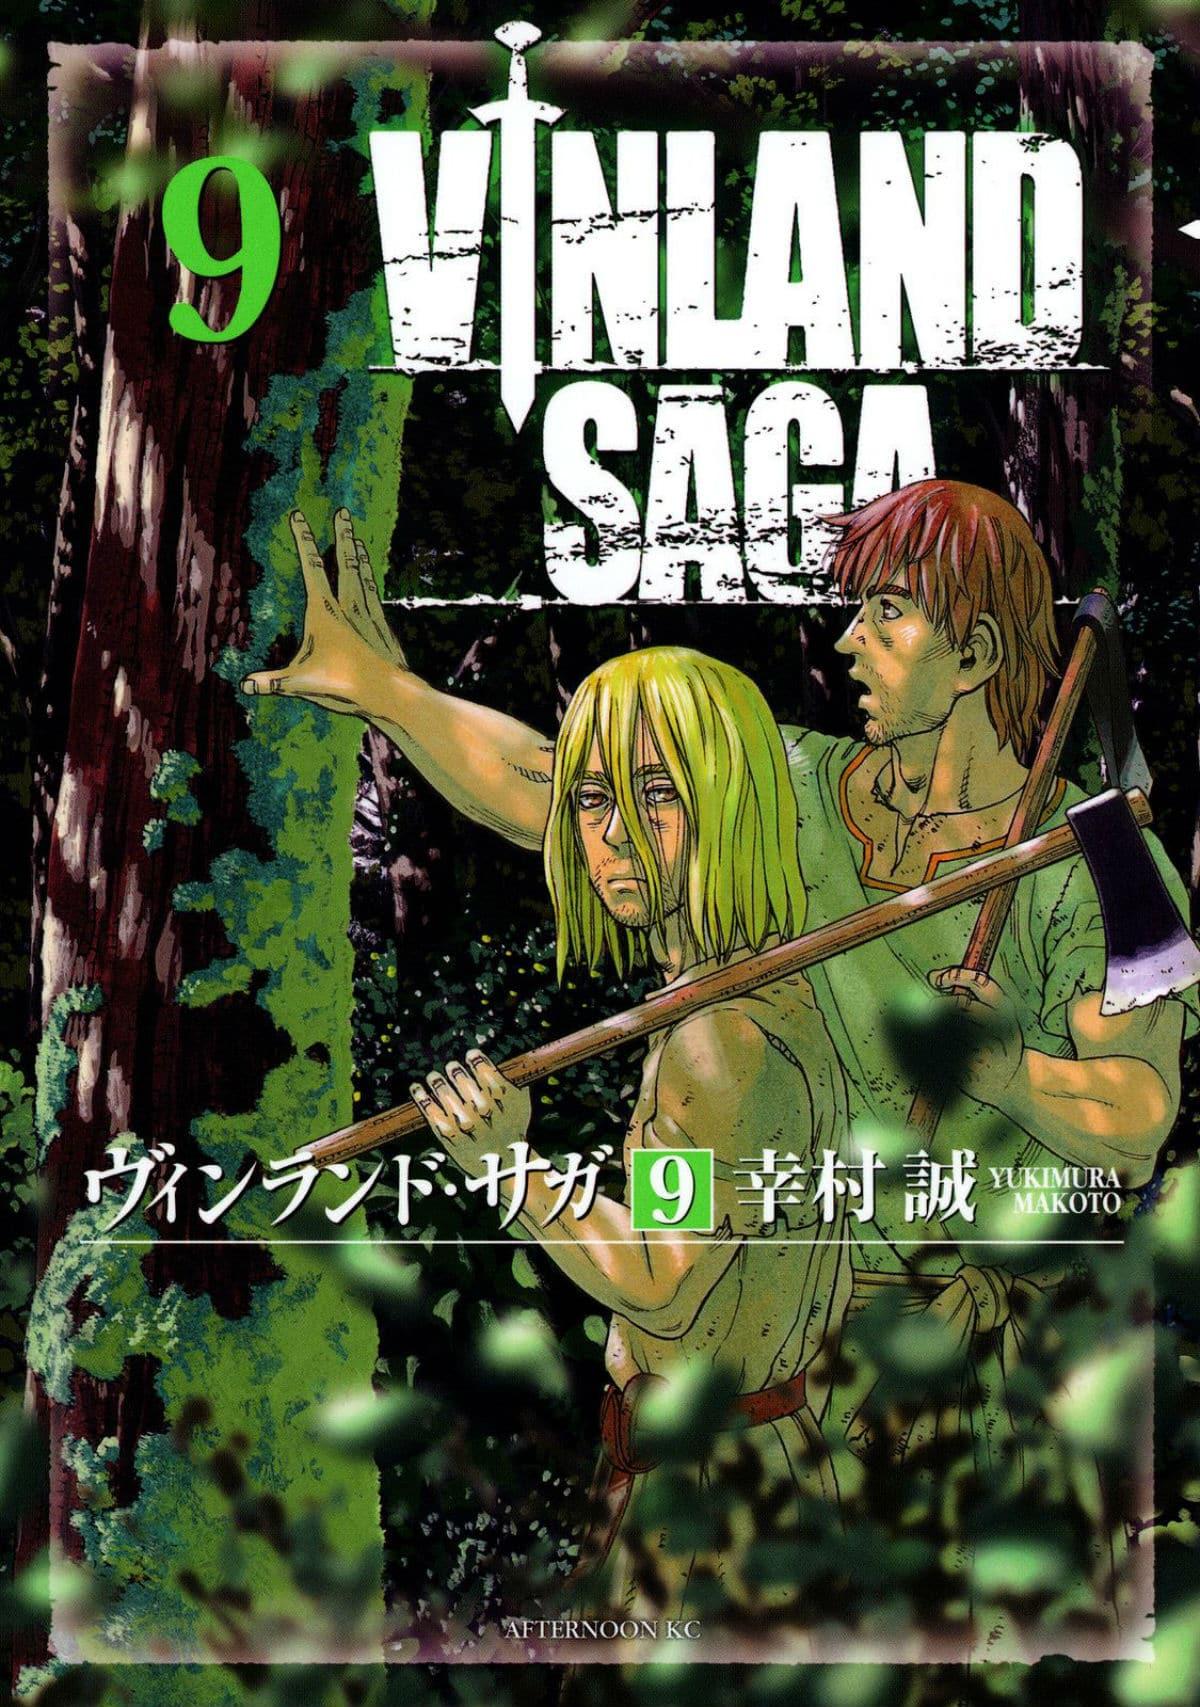 Vinland Saga Volume 10 Manga Cover Art